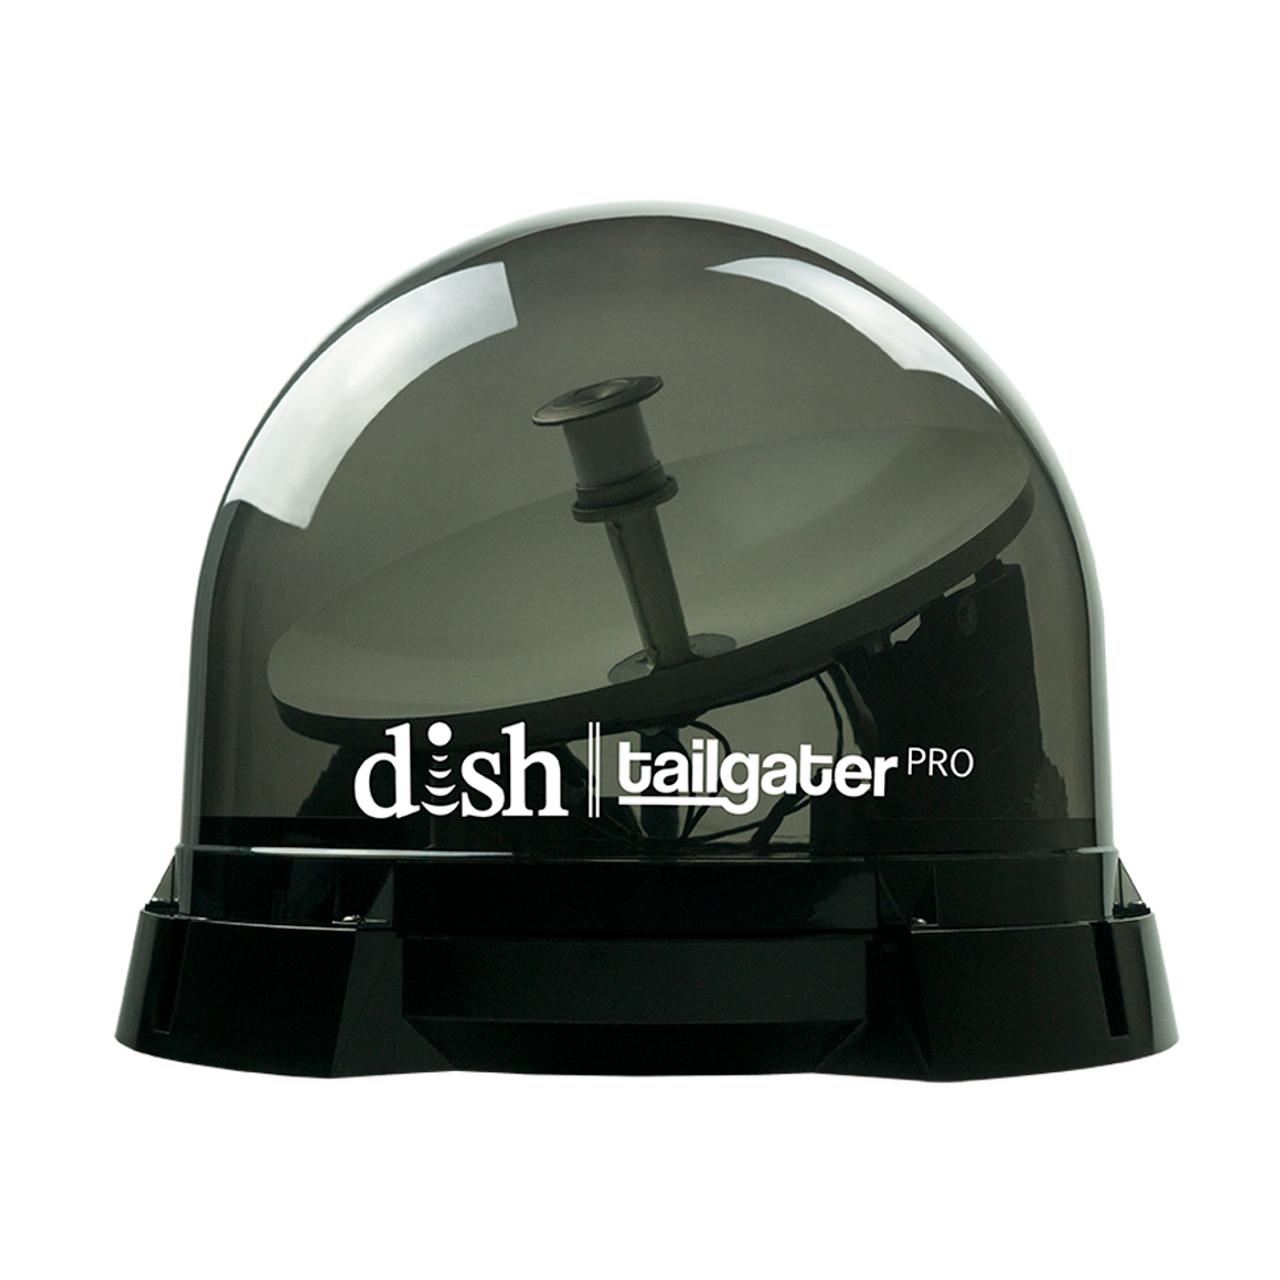 DISH Tailgater® Pro Dome Cover